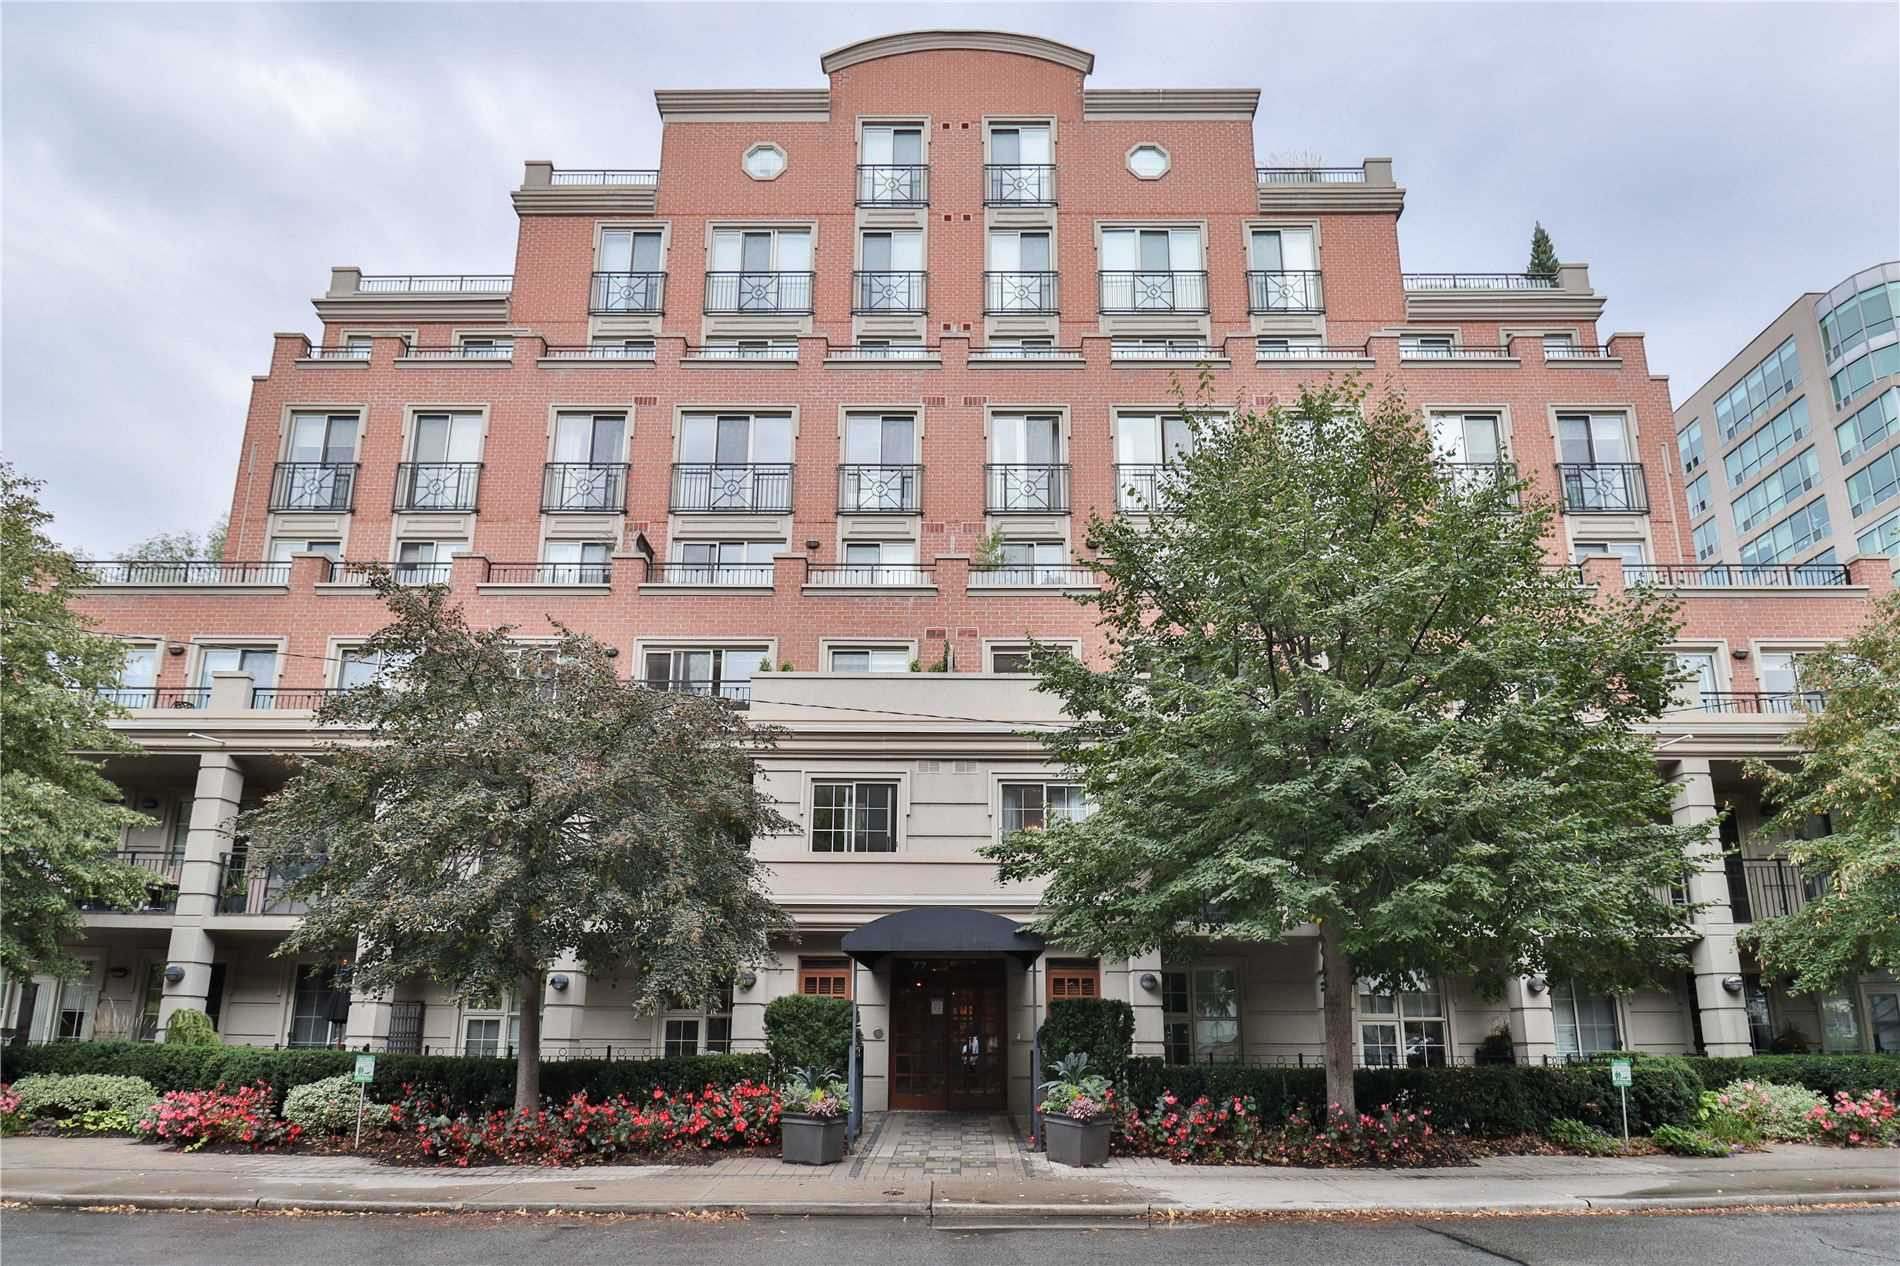 115 - 77 Mcmurrich St - Annex Condo Apt for sale, 2 Bedrooms (C5409567) - #1